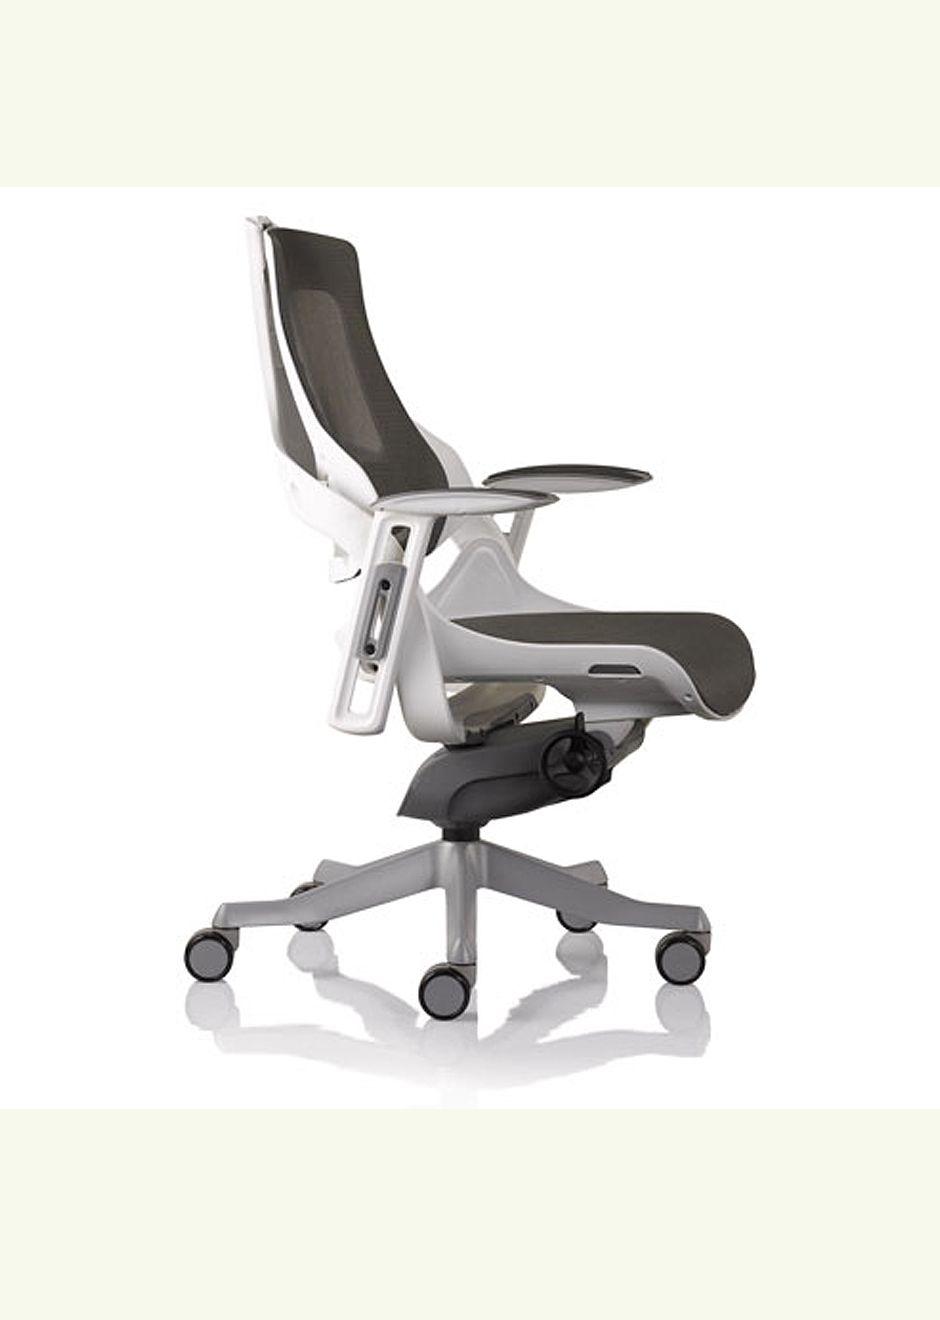 stylish office chairs. \u003ch3\u003eA Comfortable And Stylish Office Chair By Merryfair Available At Dimensions Office.\u003c\/h3\u003e WAU Mesh Has A Surface That Chairs